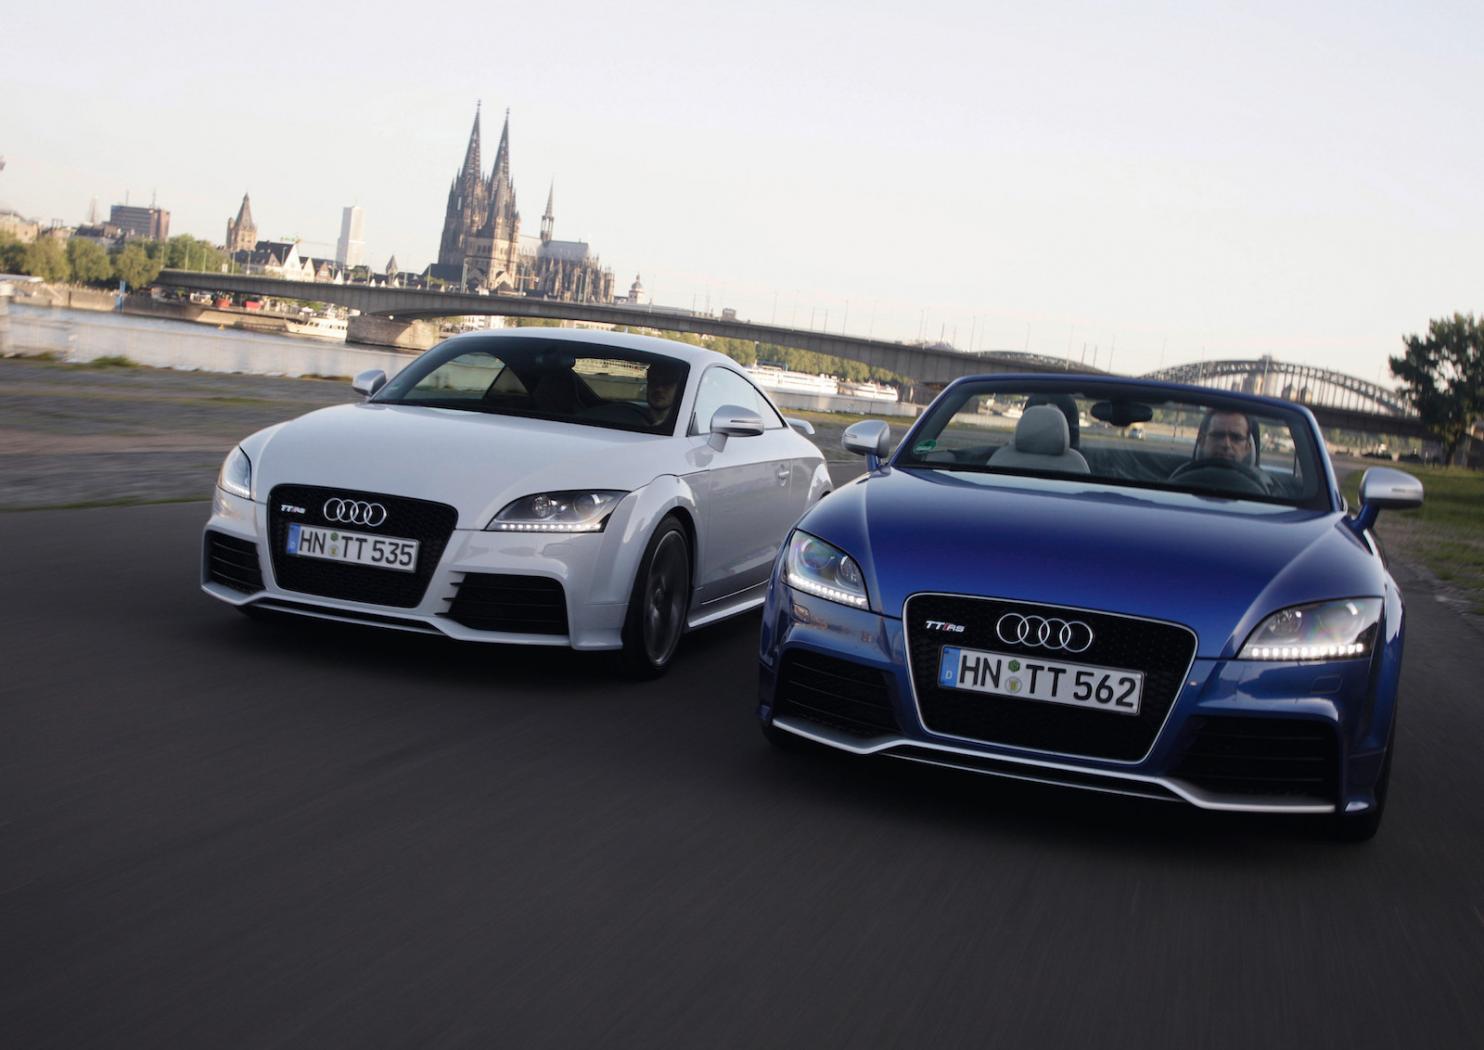 Audi-TT-RS-MK2-Disques-voiles-1.jpeg